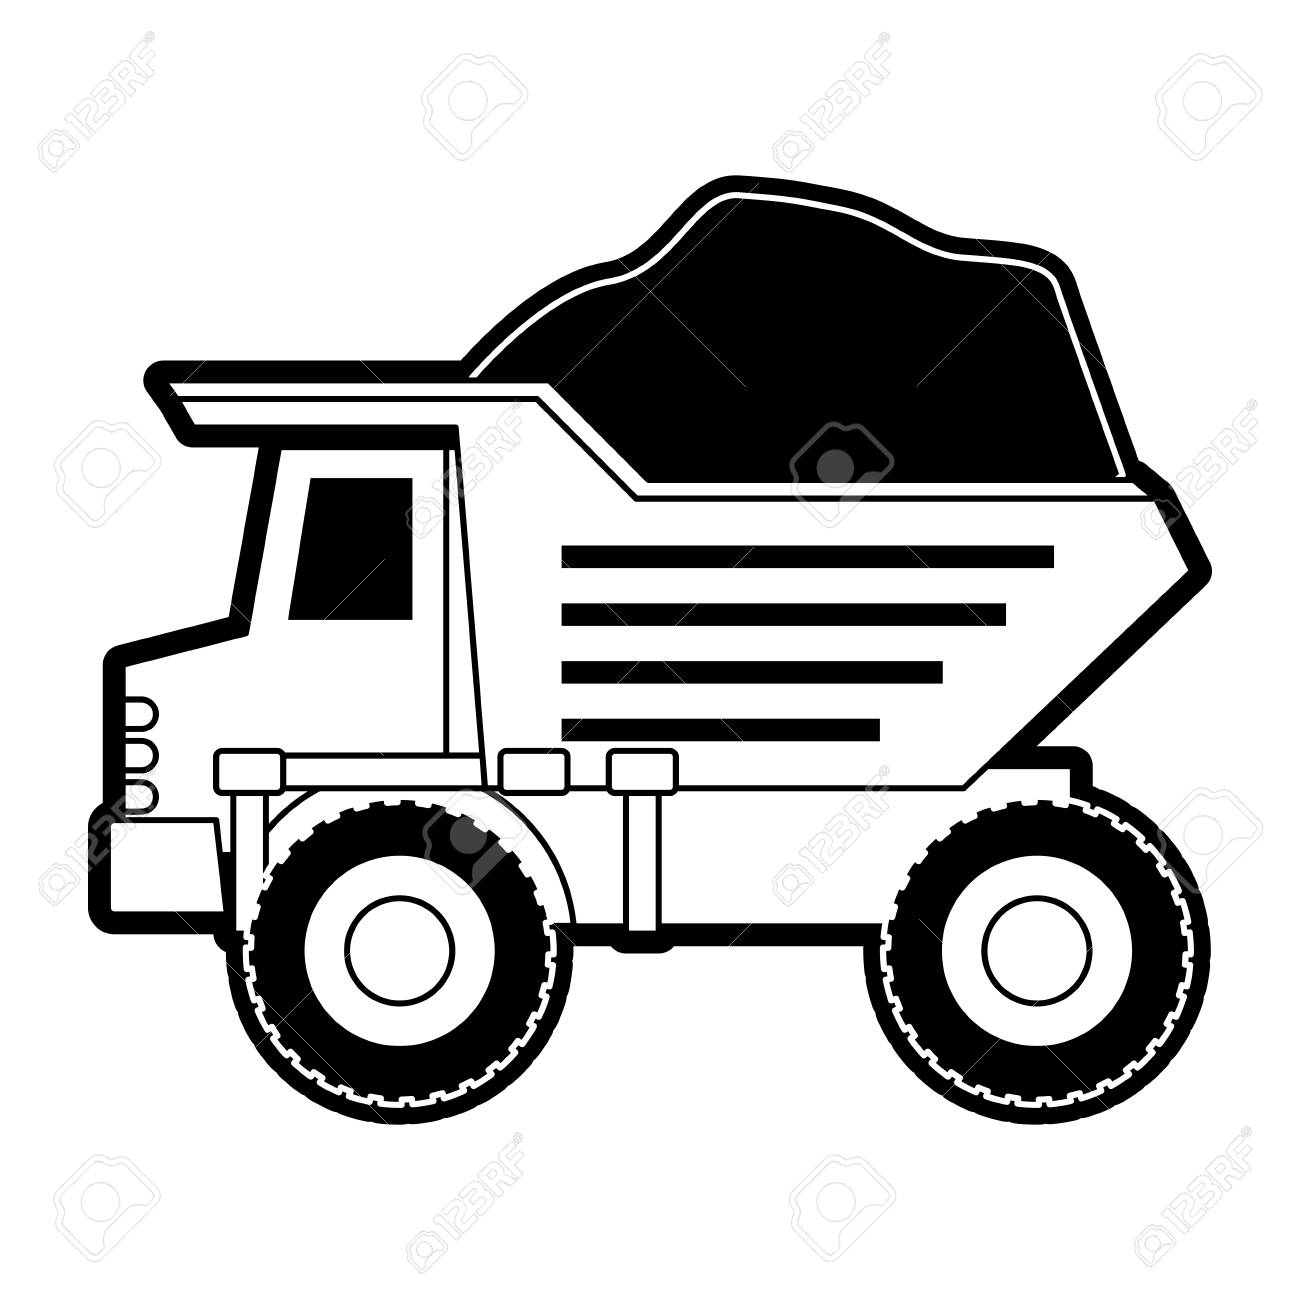 dump truck with rocks on monochrome silhouette vector illustration.